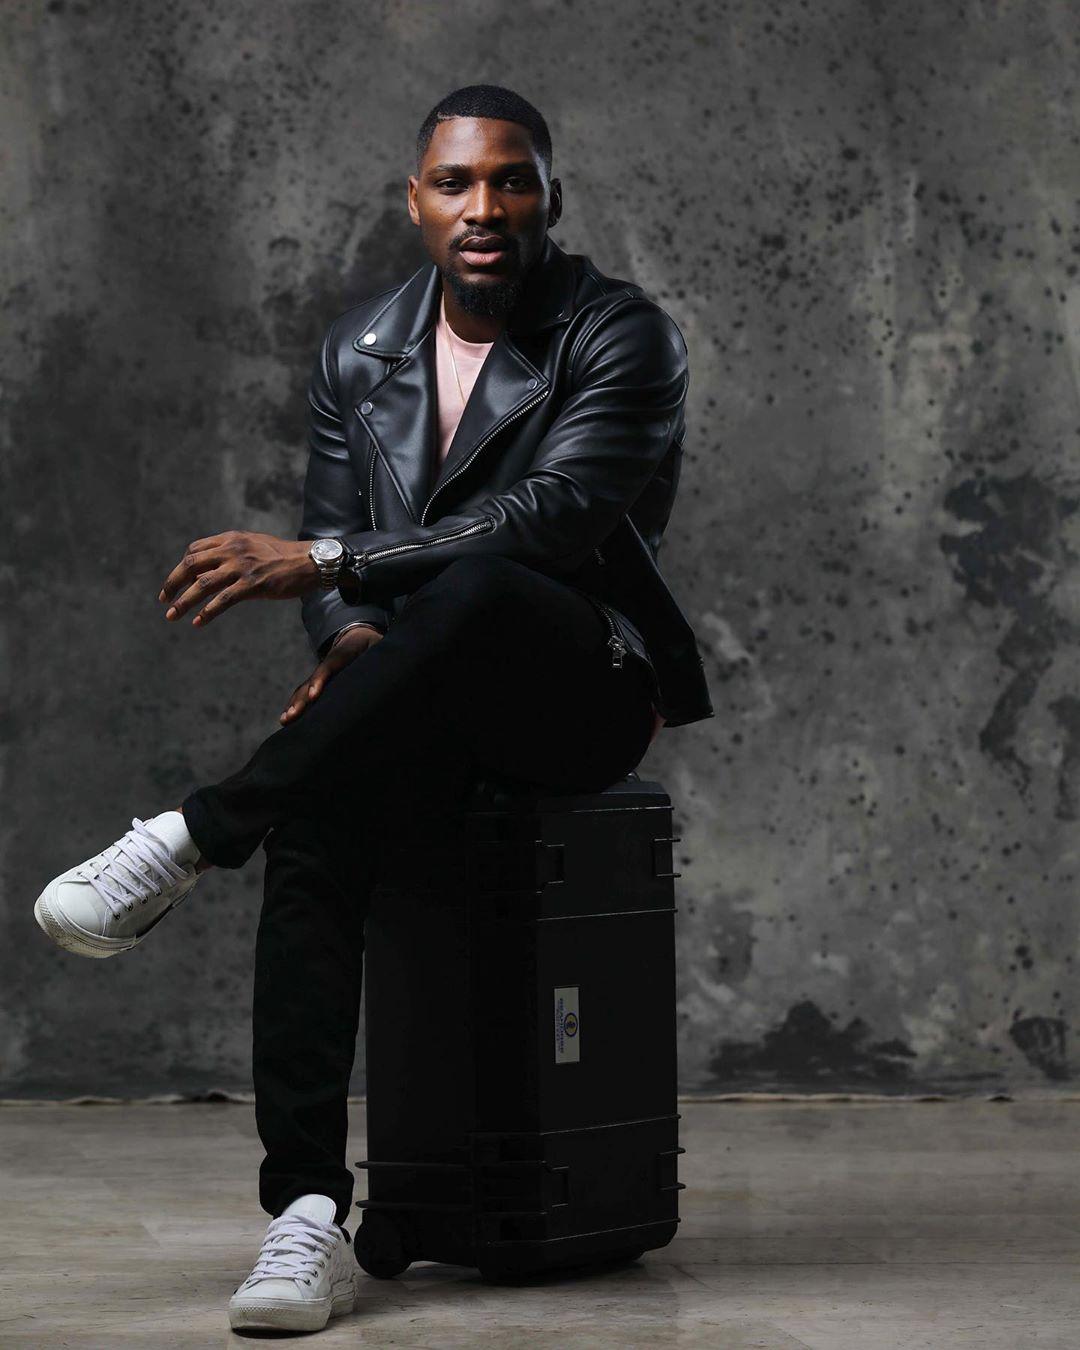 black-men-style-african-male-celebrities-tobi-bakre